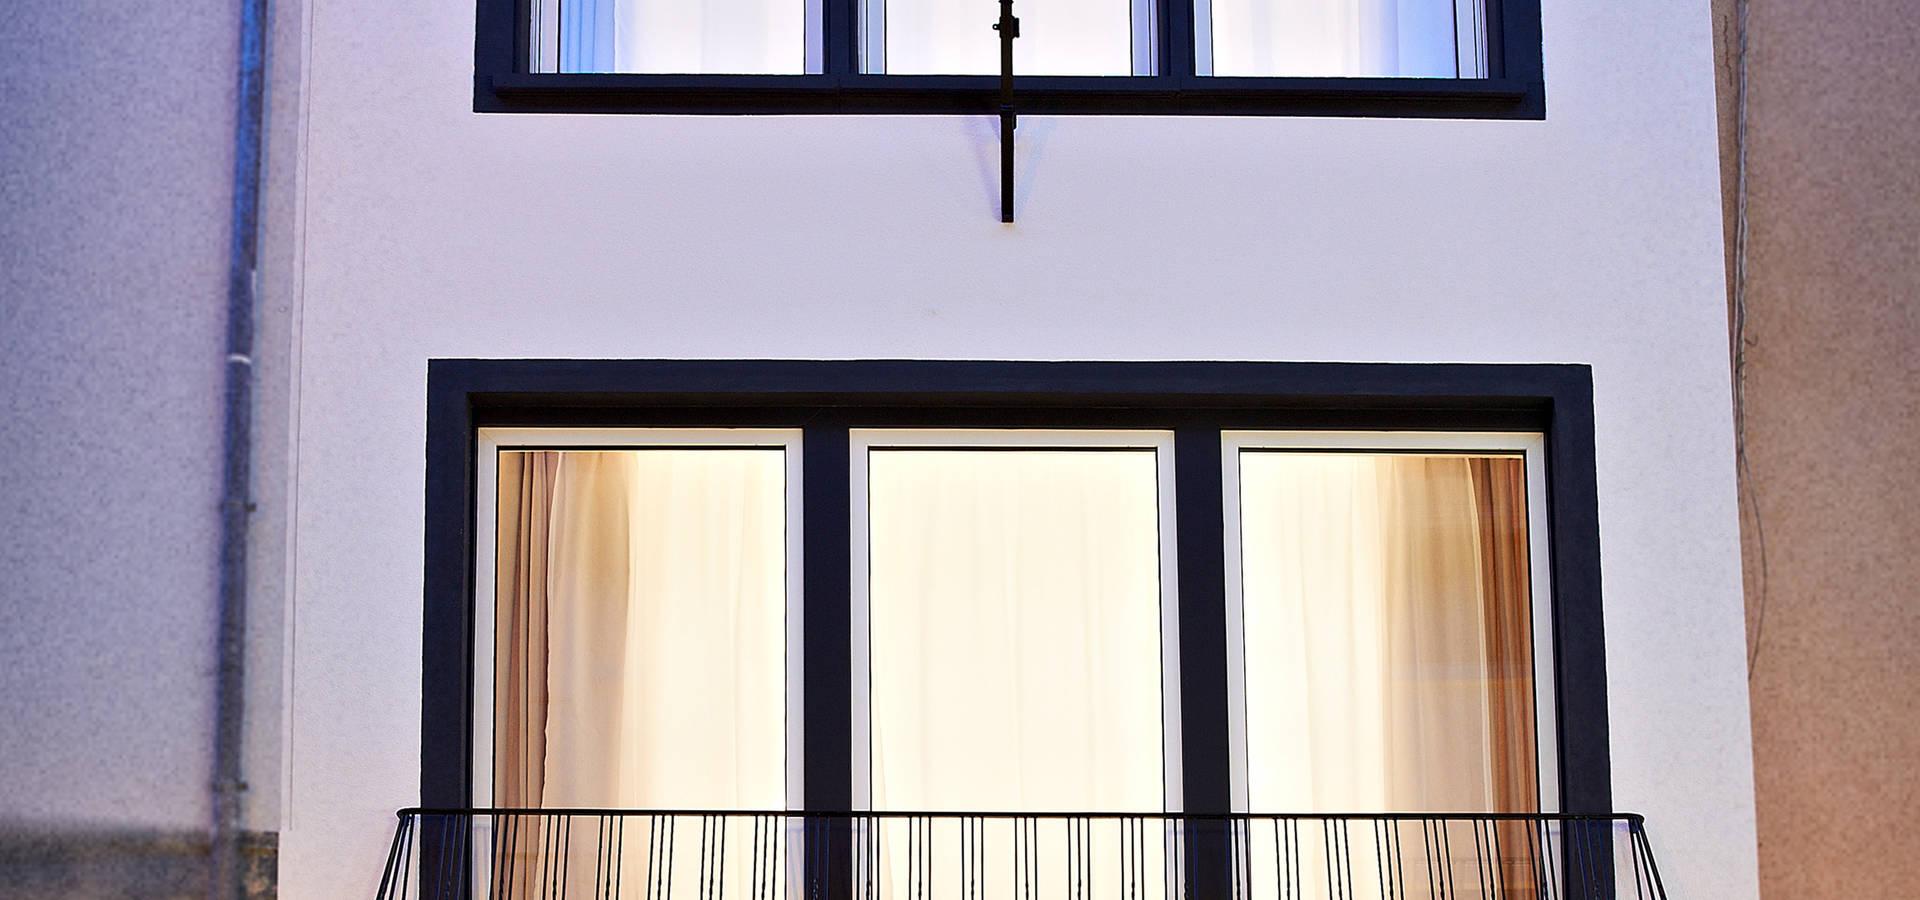 Architekturbüro Götz Oertel